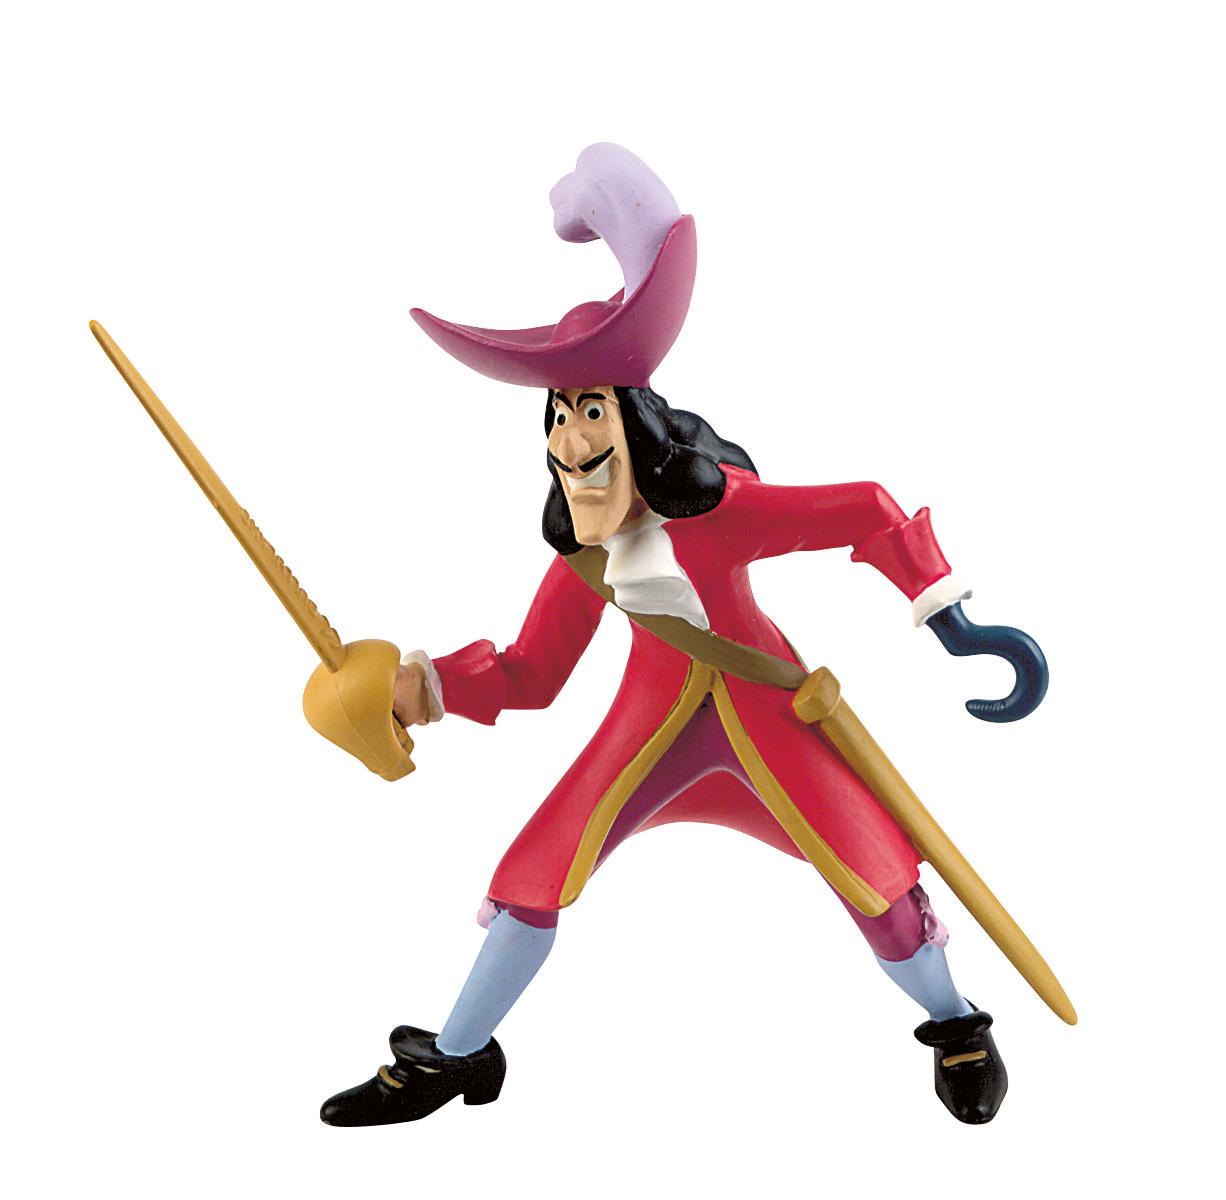 Figurine Peter Pan Disney - Capitaine Crochet - 10 cm